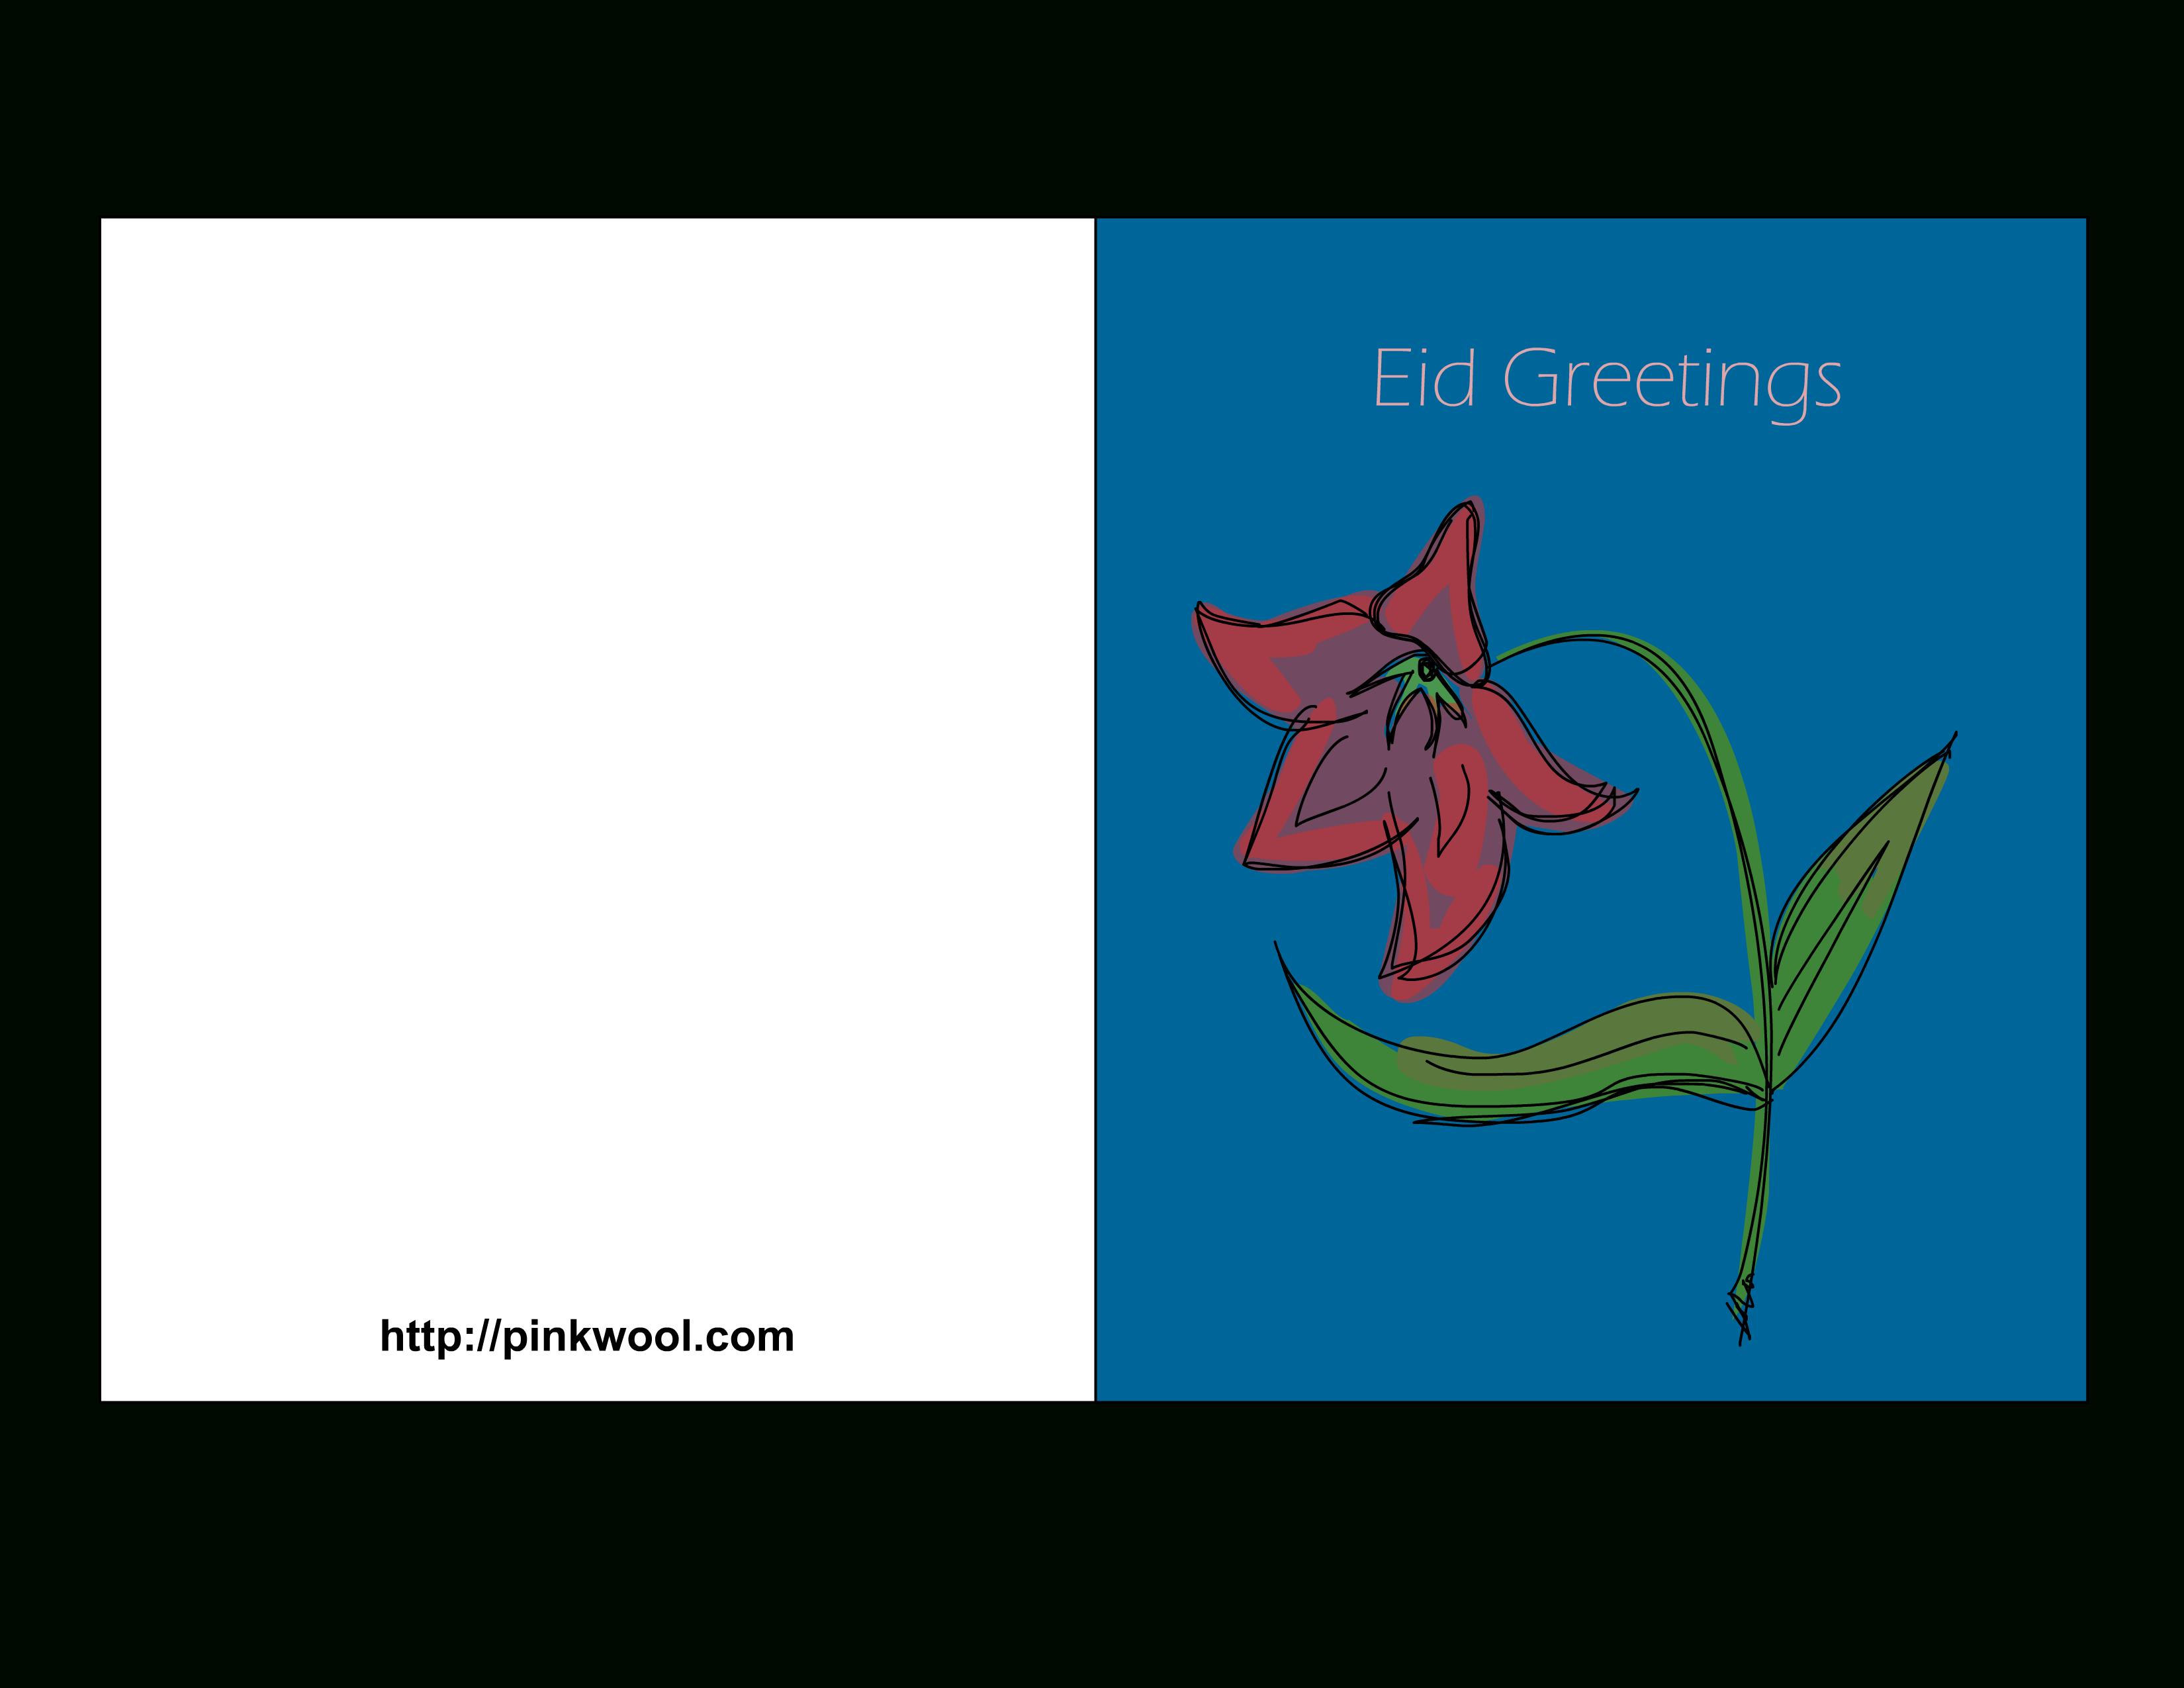 Free Printable Eid Greeting Cards - Free Printable Greeting Cards